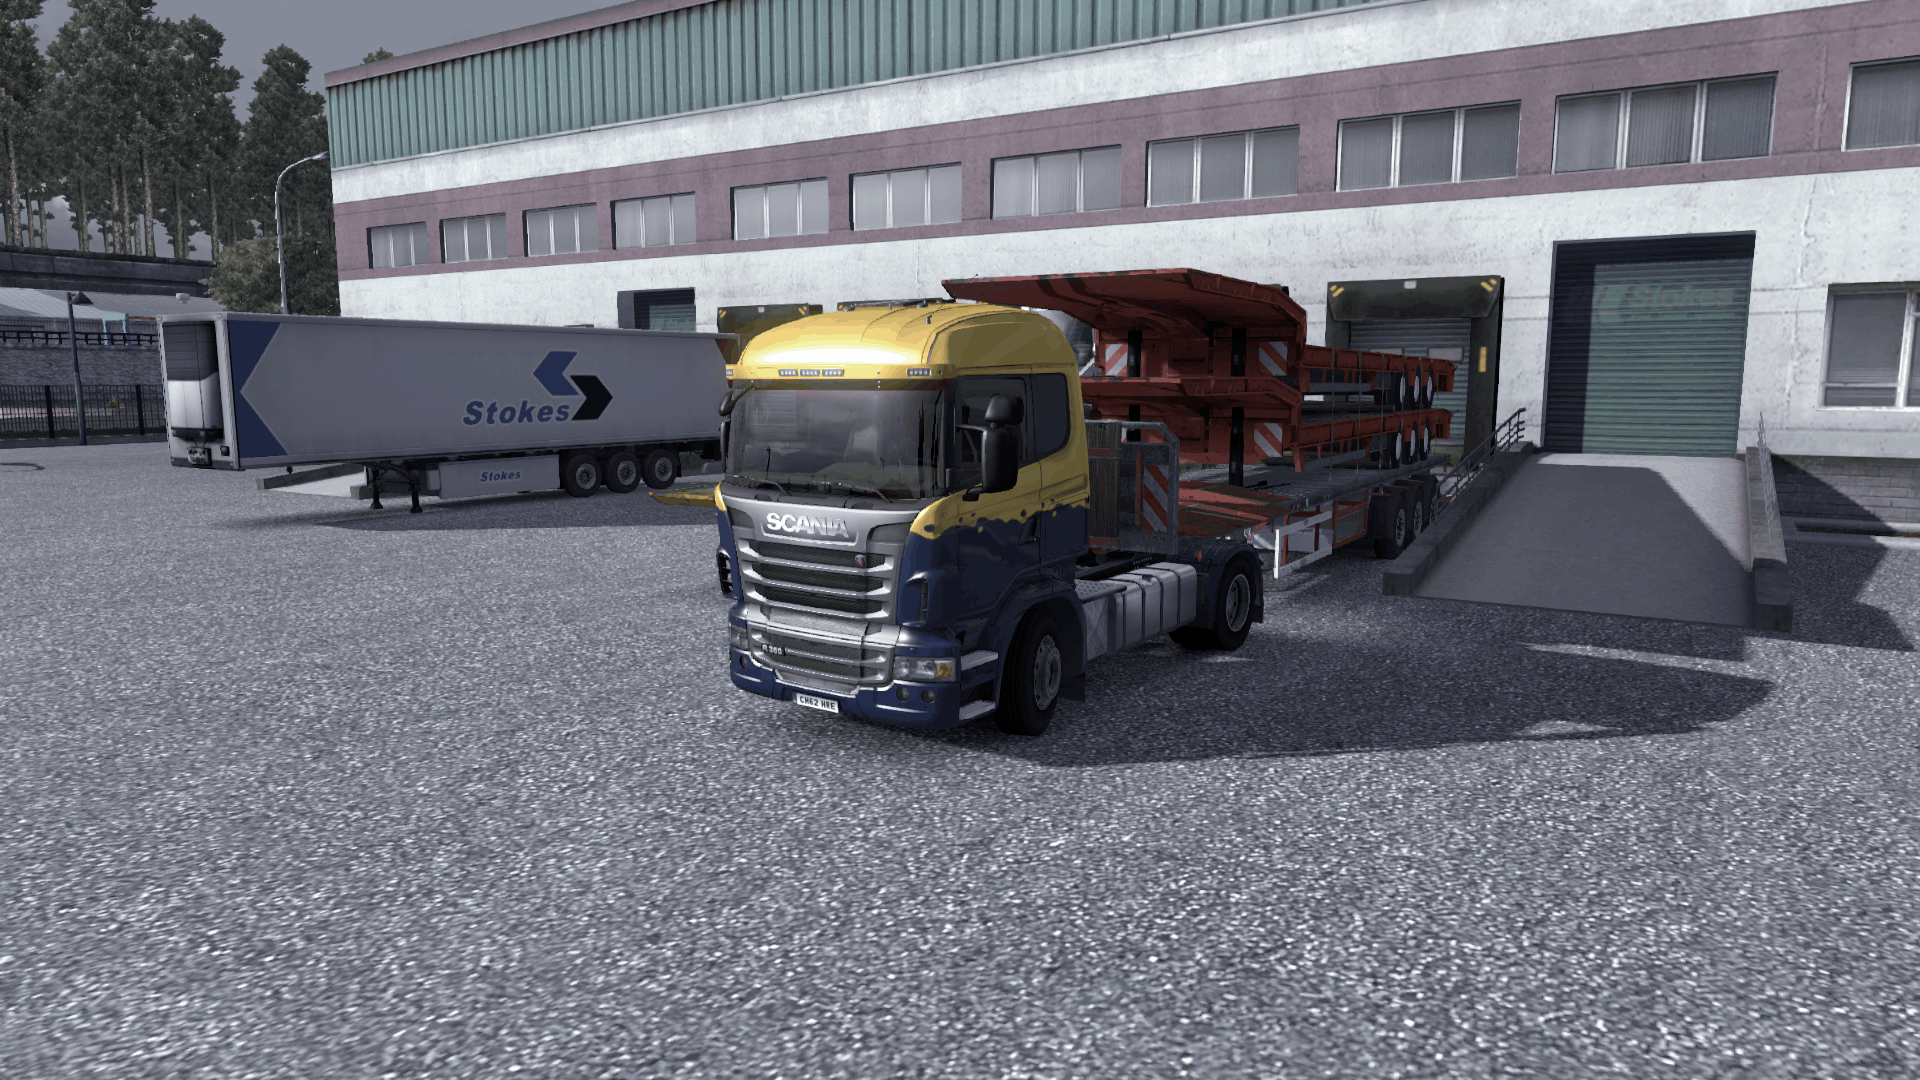 https://www.fullgamepc.com/euro-truck-simulator-2-download/